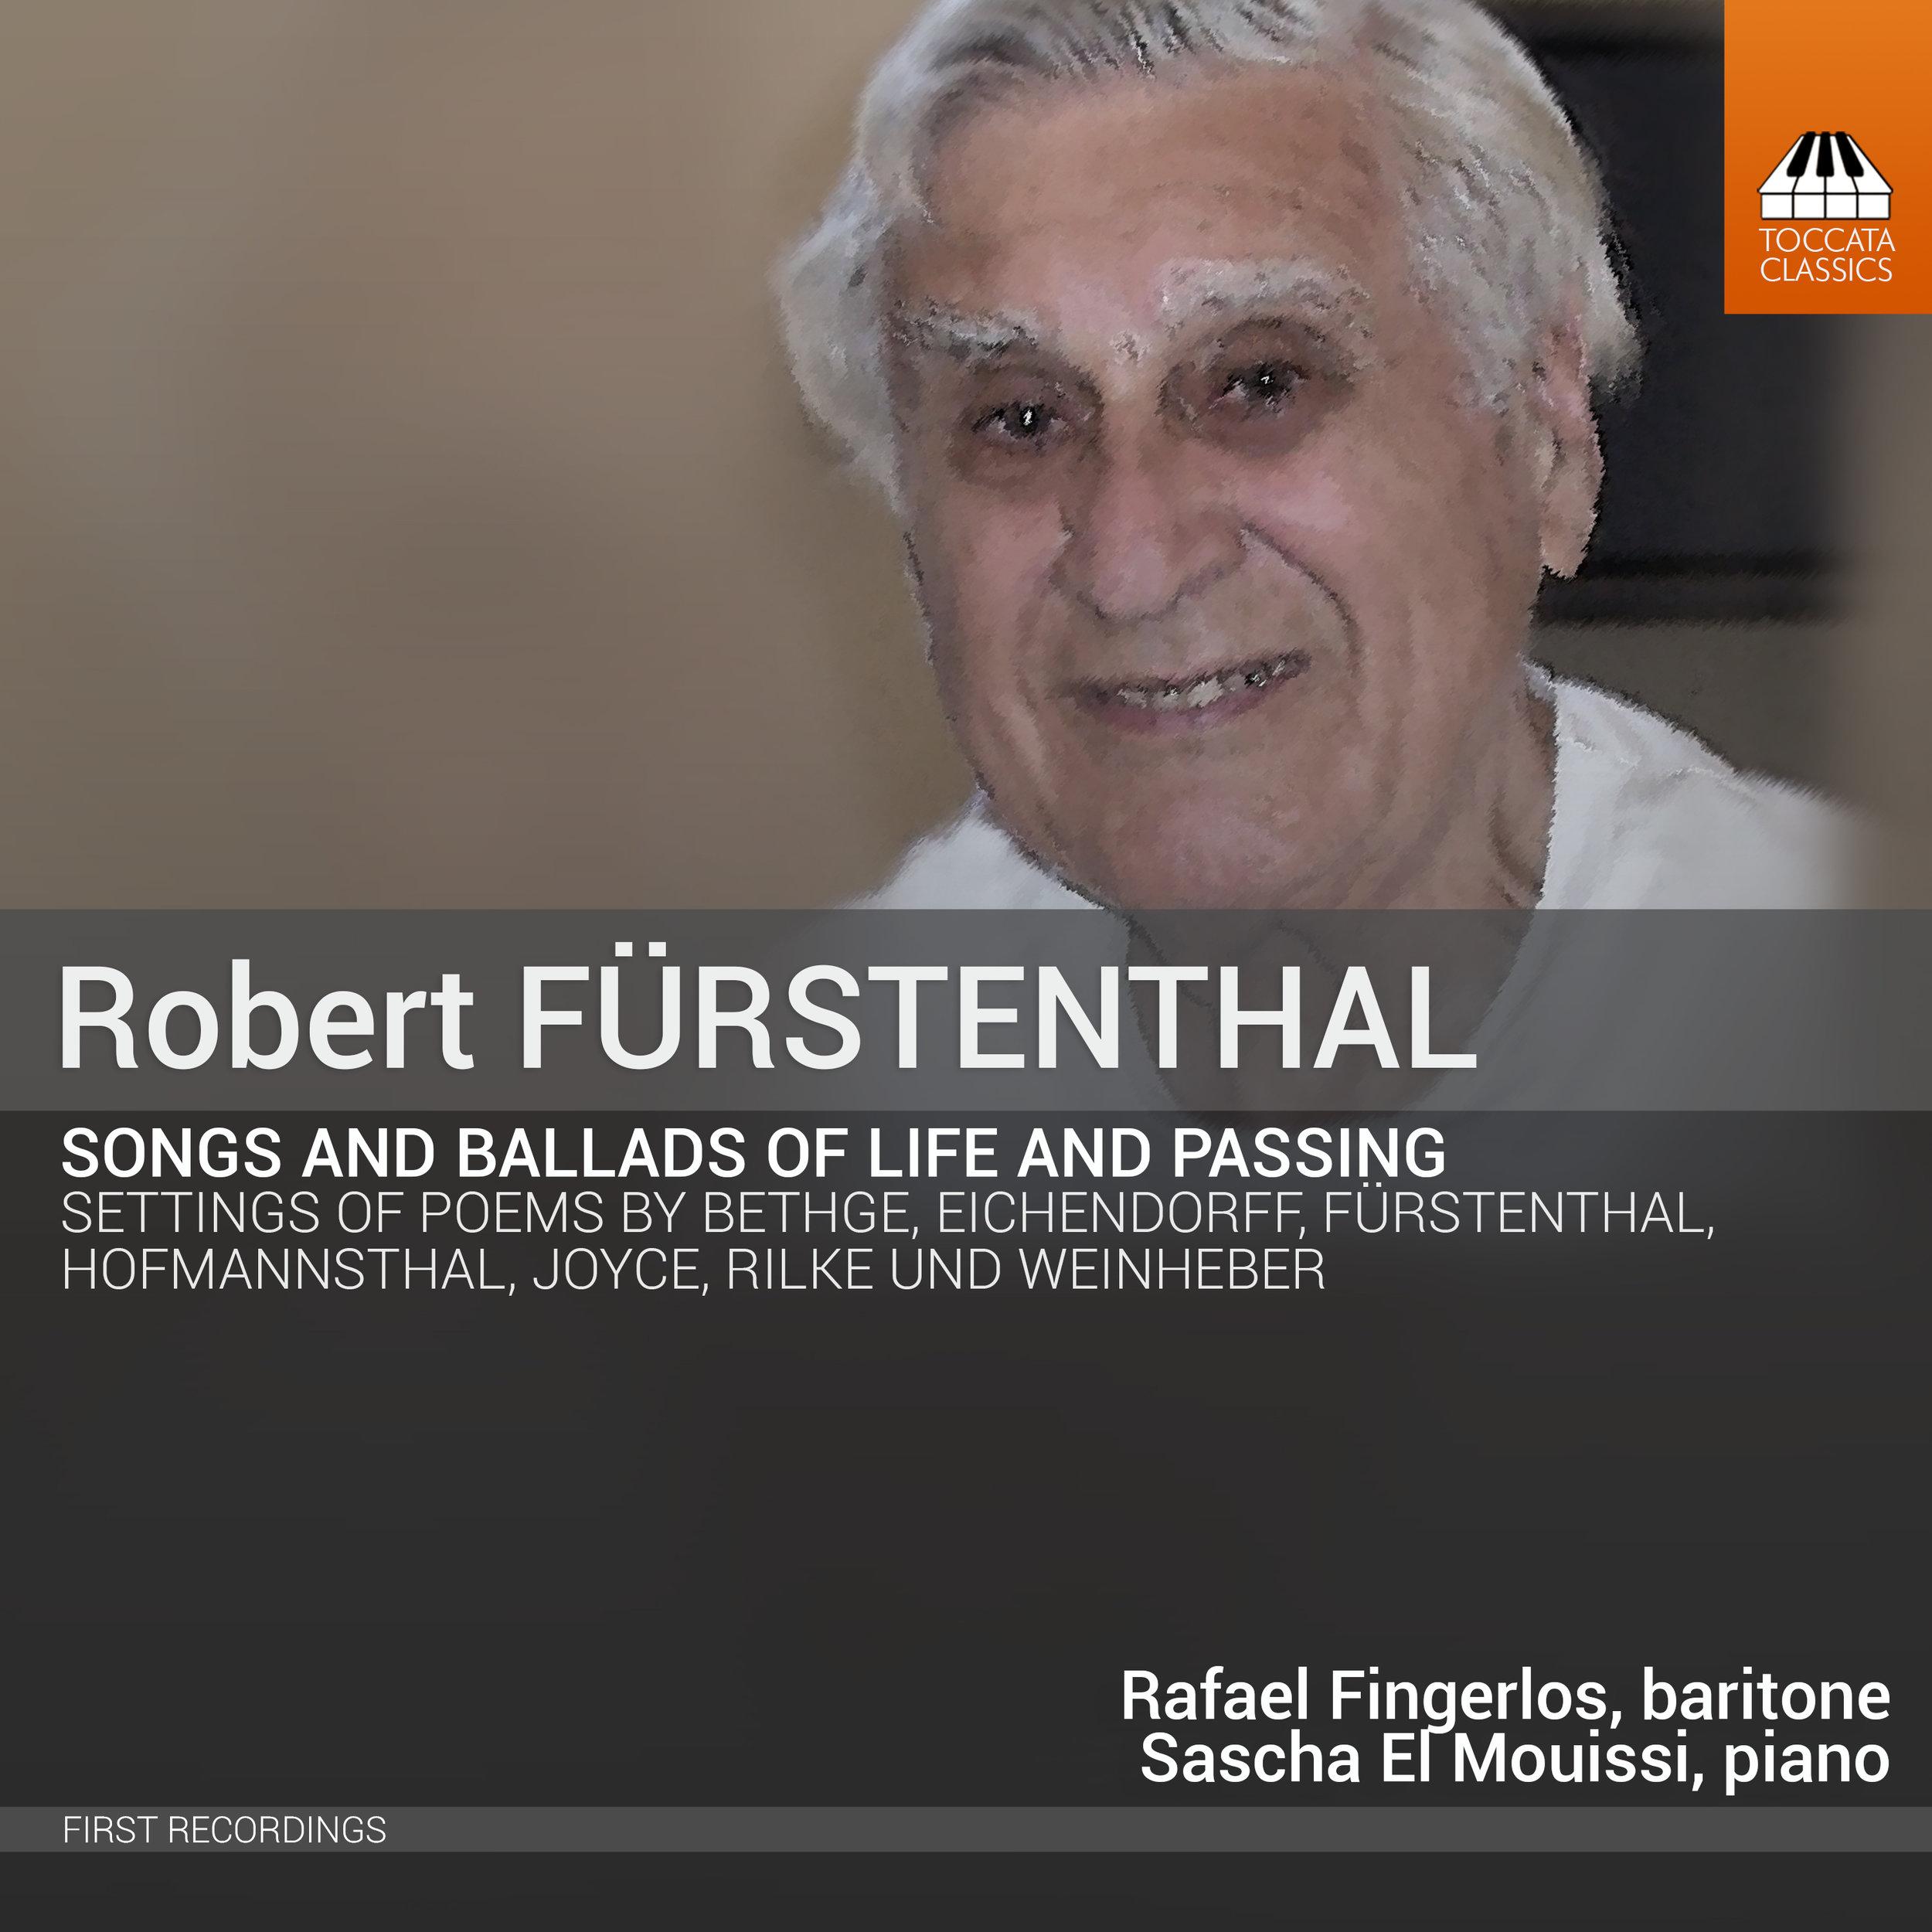 TOCC 0354 Furstenthal songs.jpg